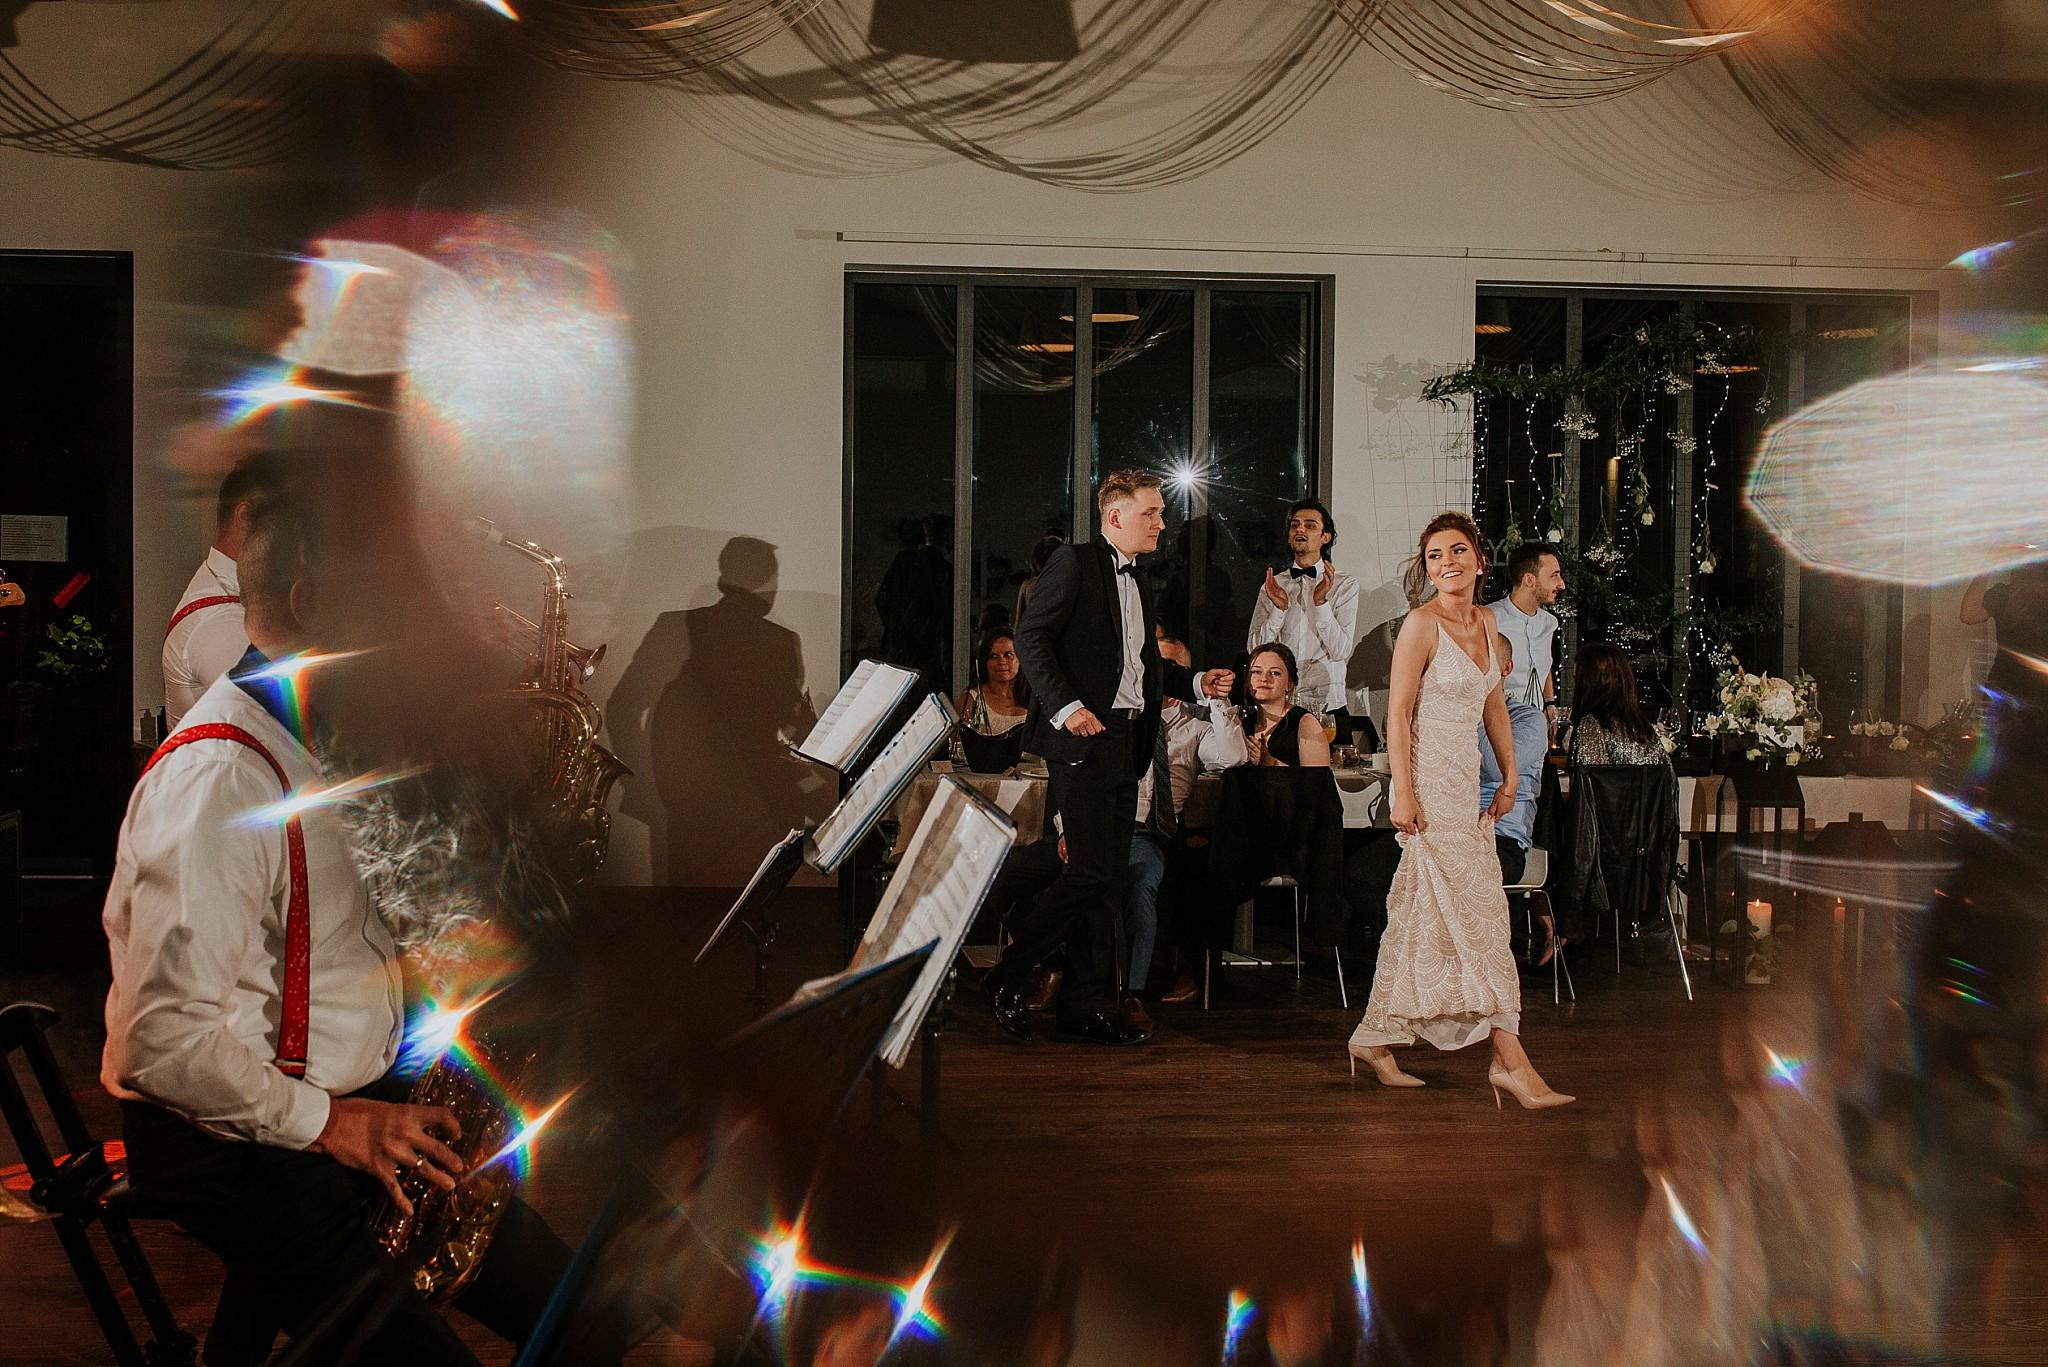 fotograf poznan wesele dobra truskawka piekne wesele pod poznaniem wesele w dobrej truskawce piekna para mloda slub marzen slub koronawirus slub listopad wesele koronawirus 448